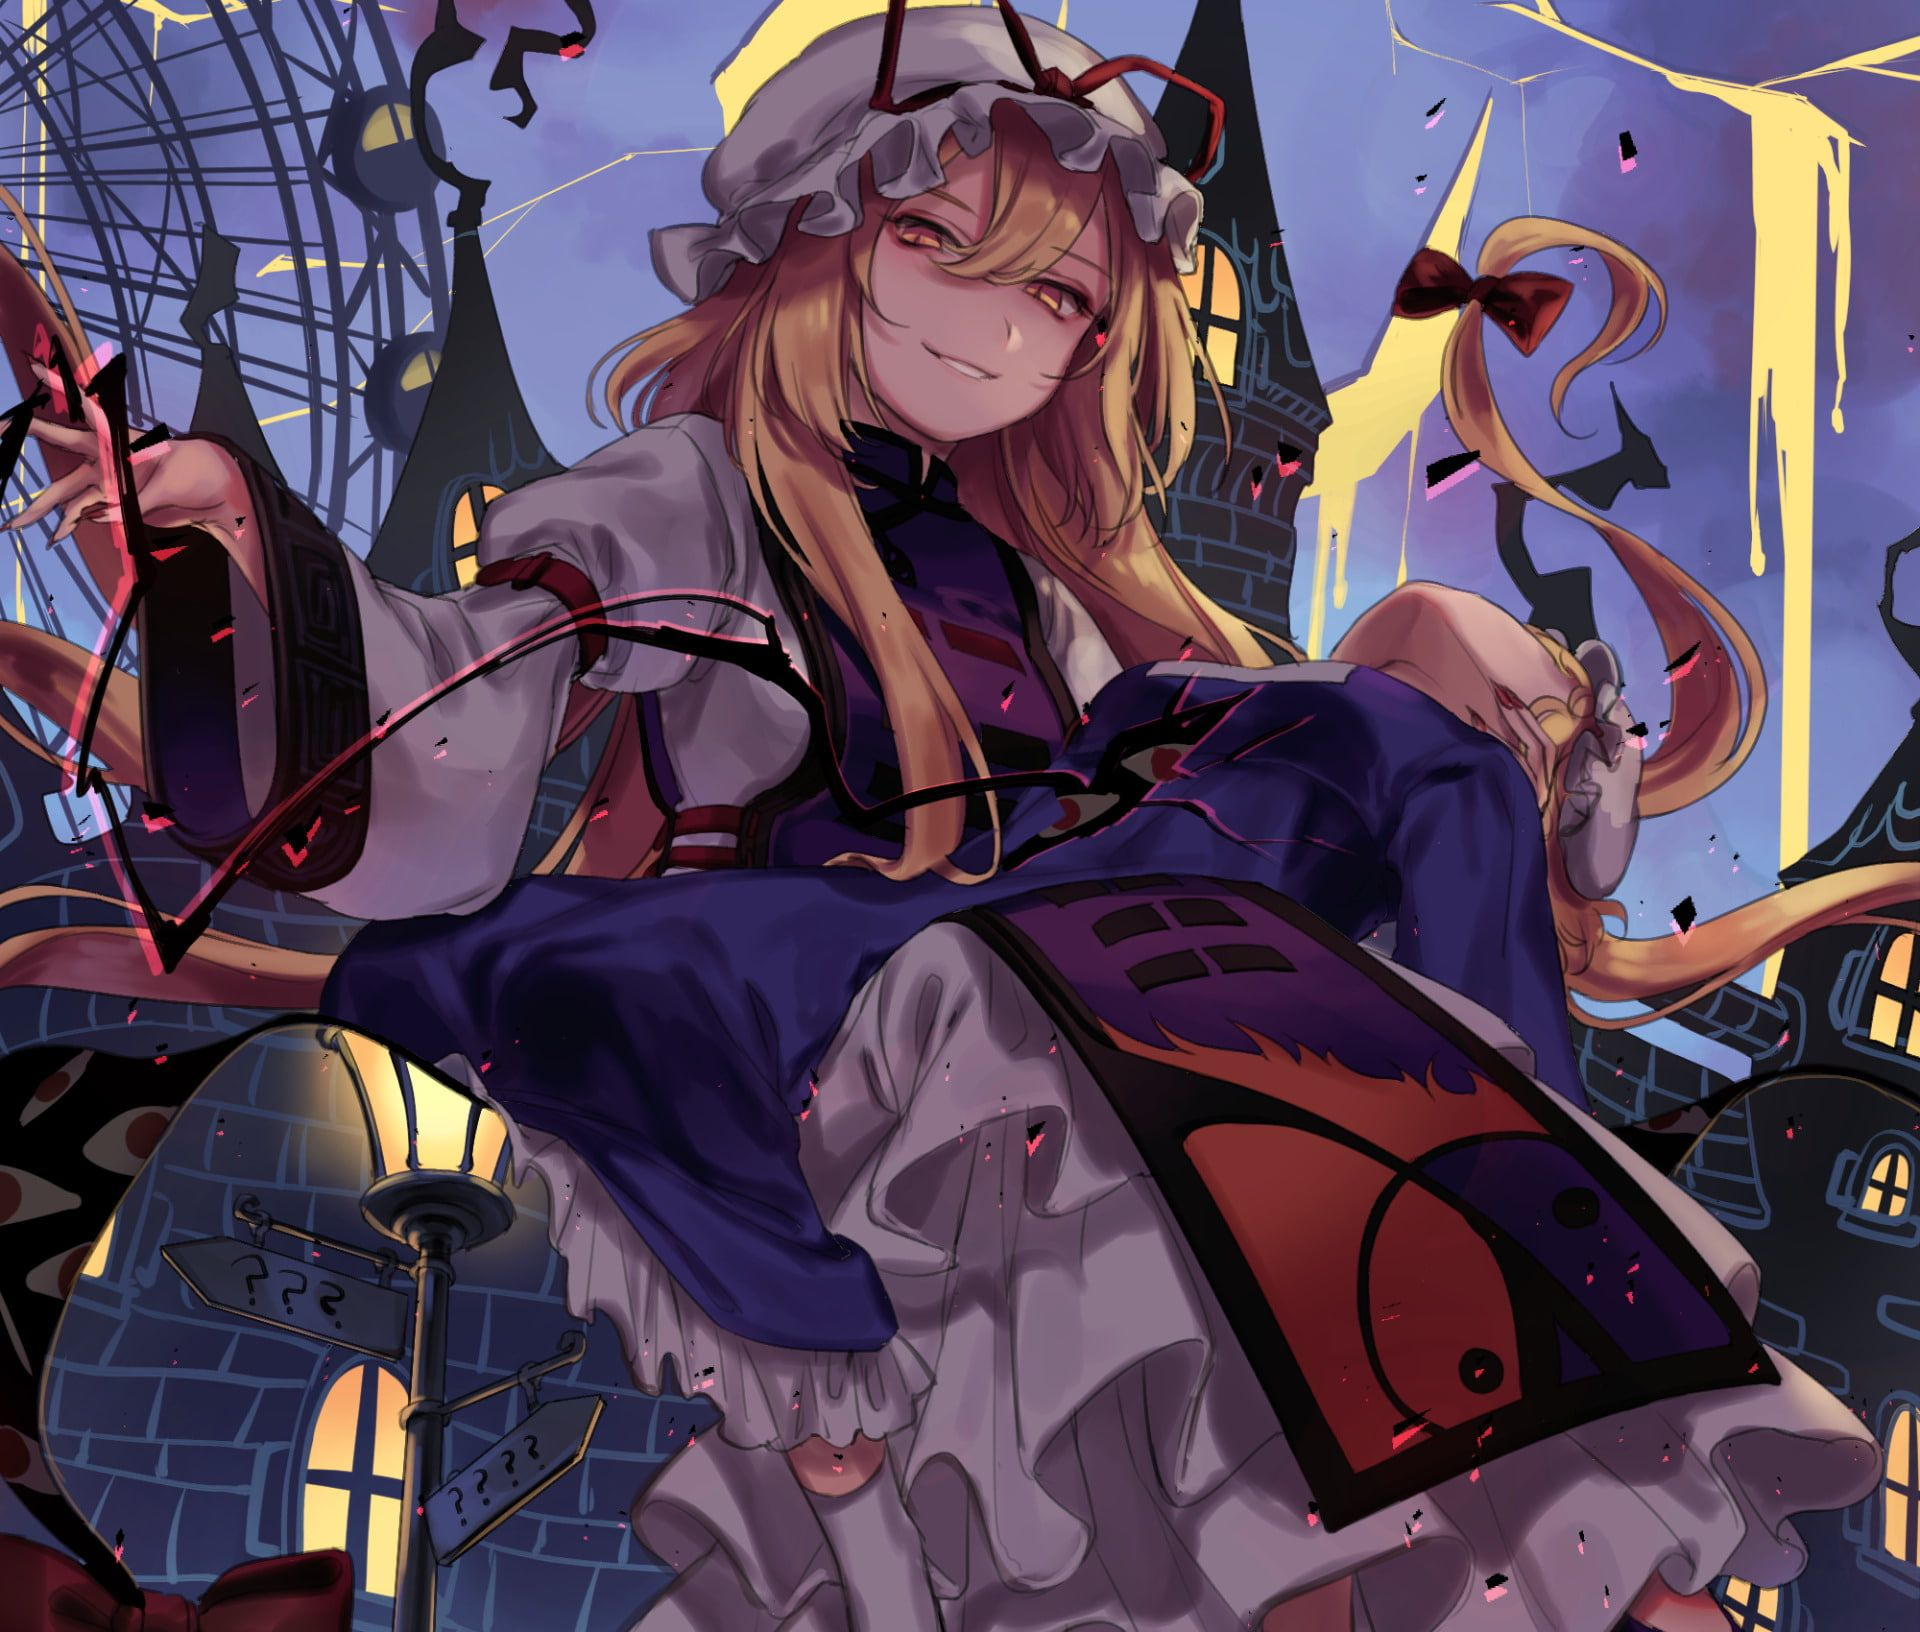 Anime Touhou Maribel Hearn Yukari Yakumo 25P wallpaper ...